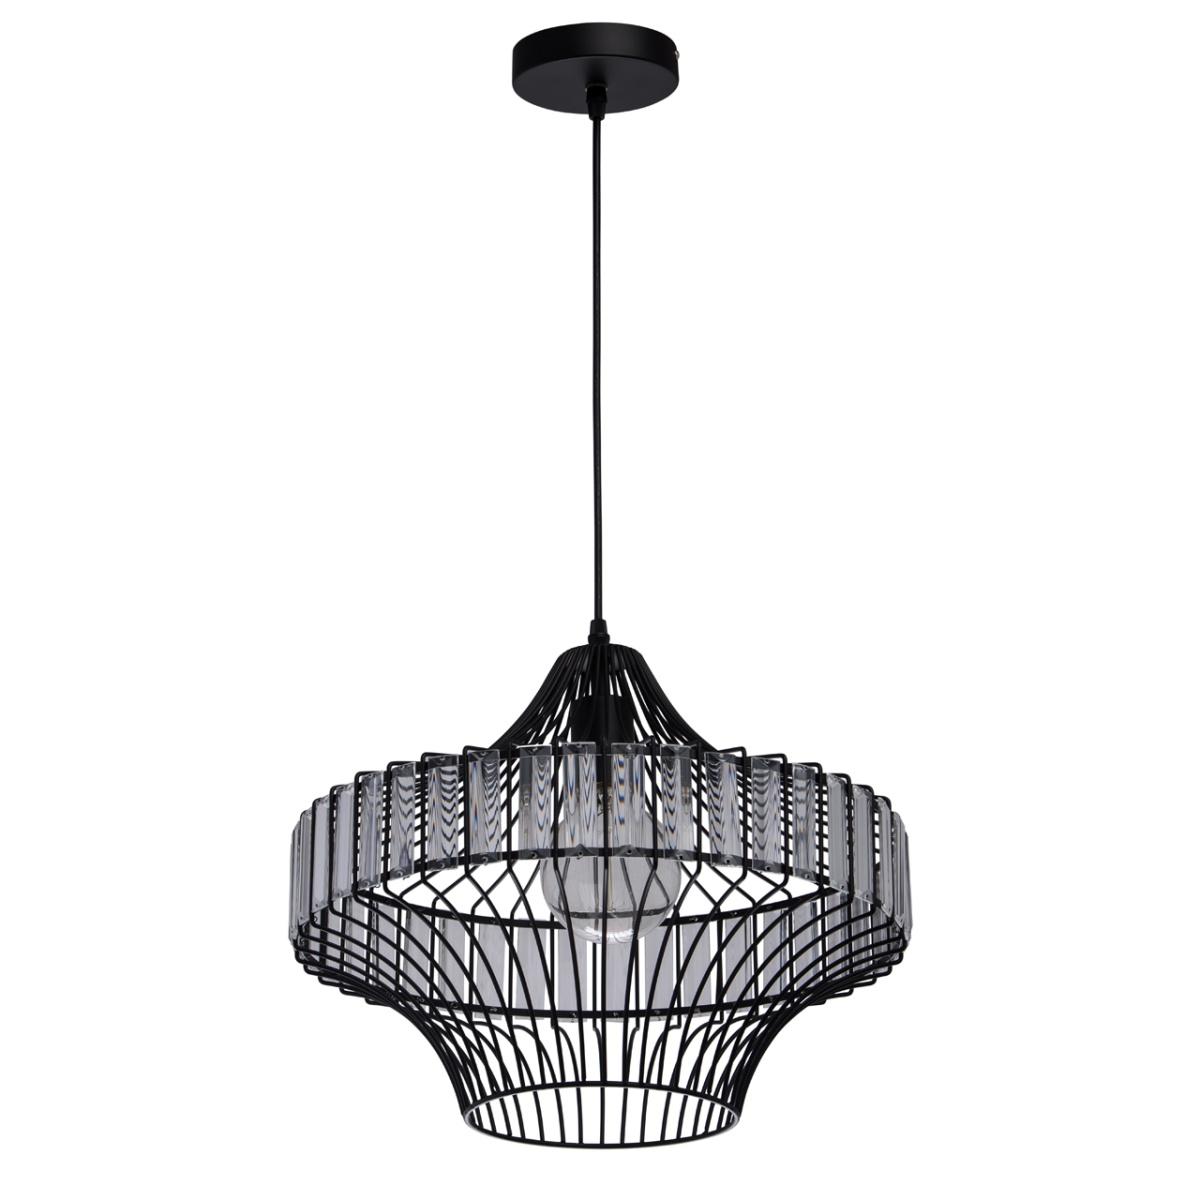 Lustra MW-Light Loft 643012101 title=Lustra MW-Light Loft 643012101